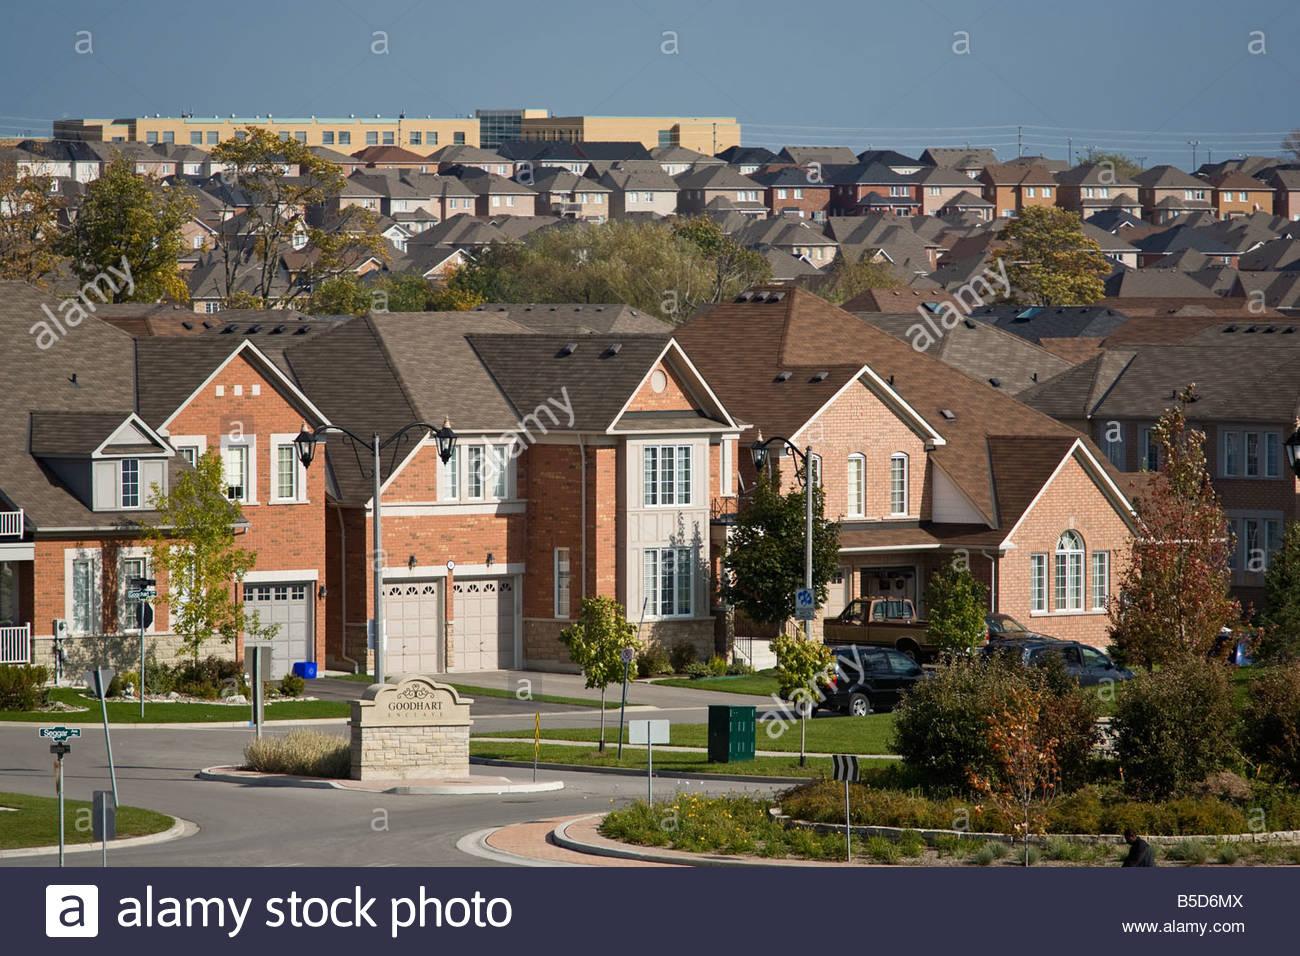 New housing creates suburban sprawl on former farmland in town of Ajax near Toronto in Southern Ontario Canada - Stock Image